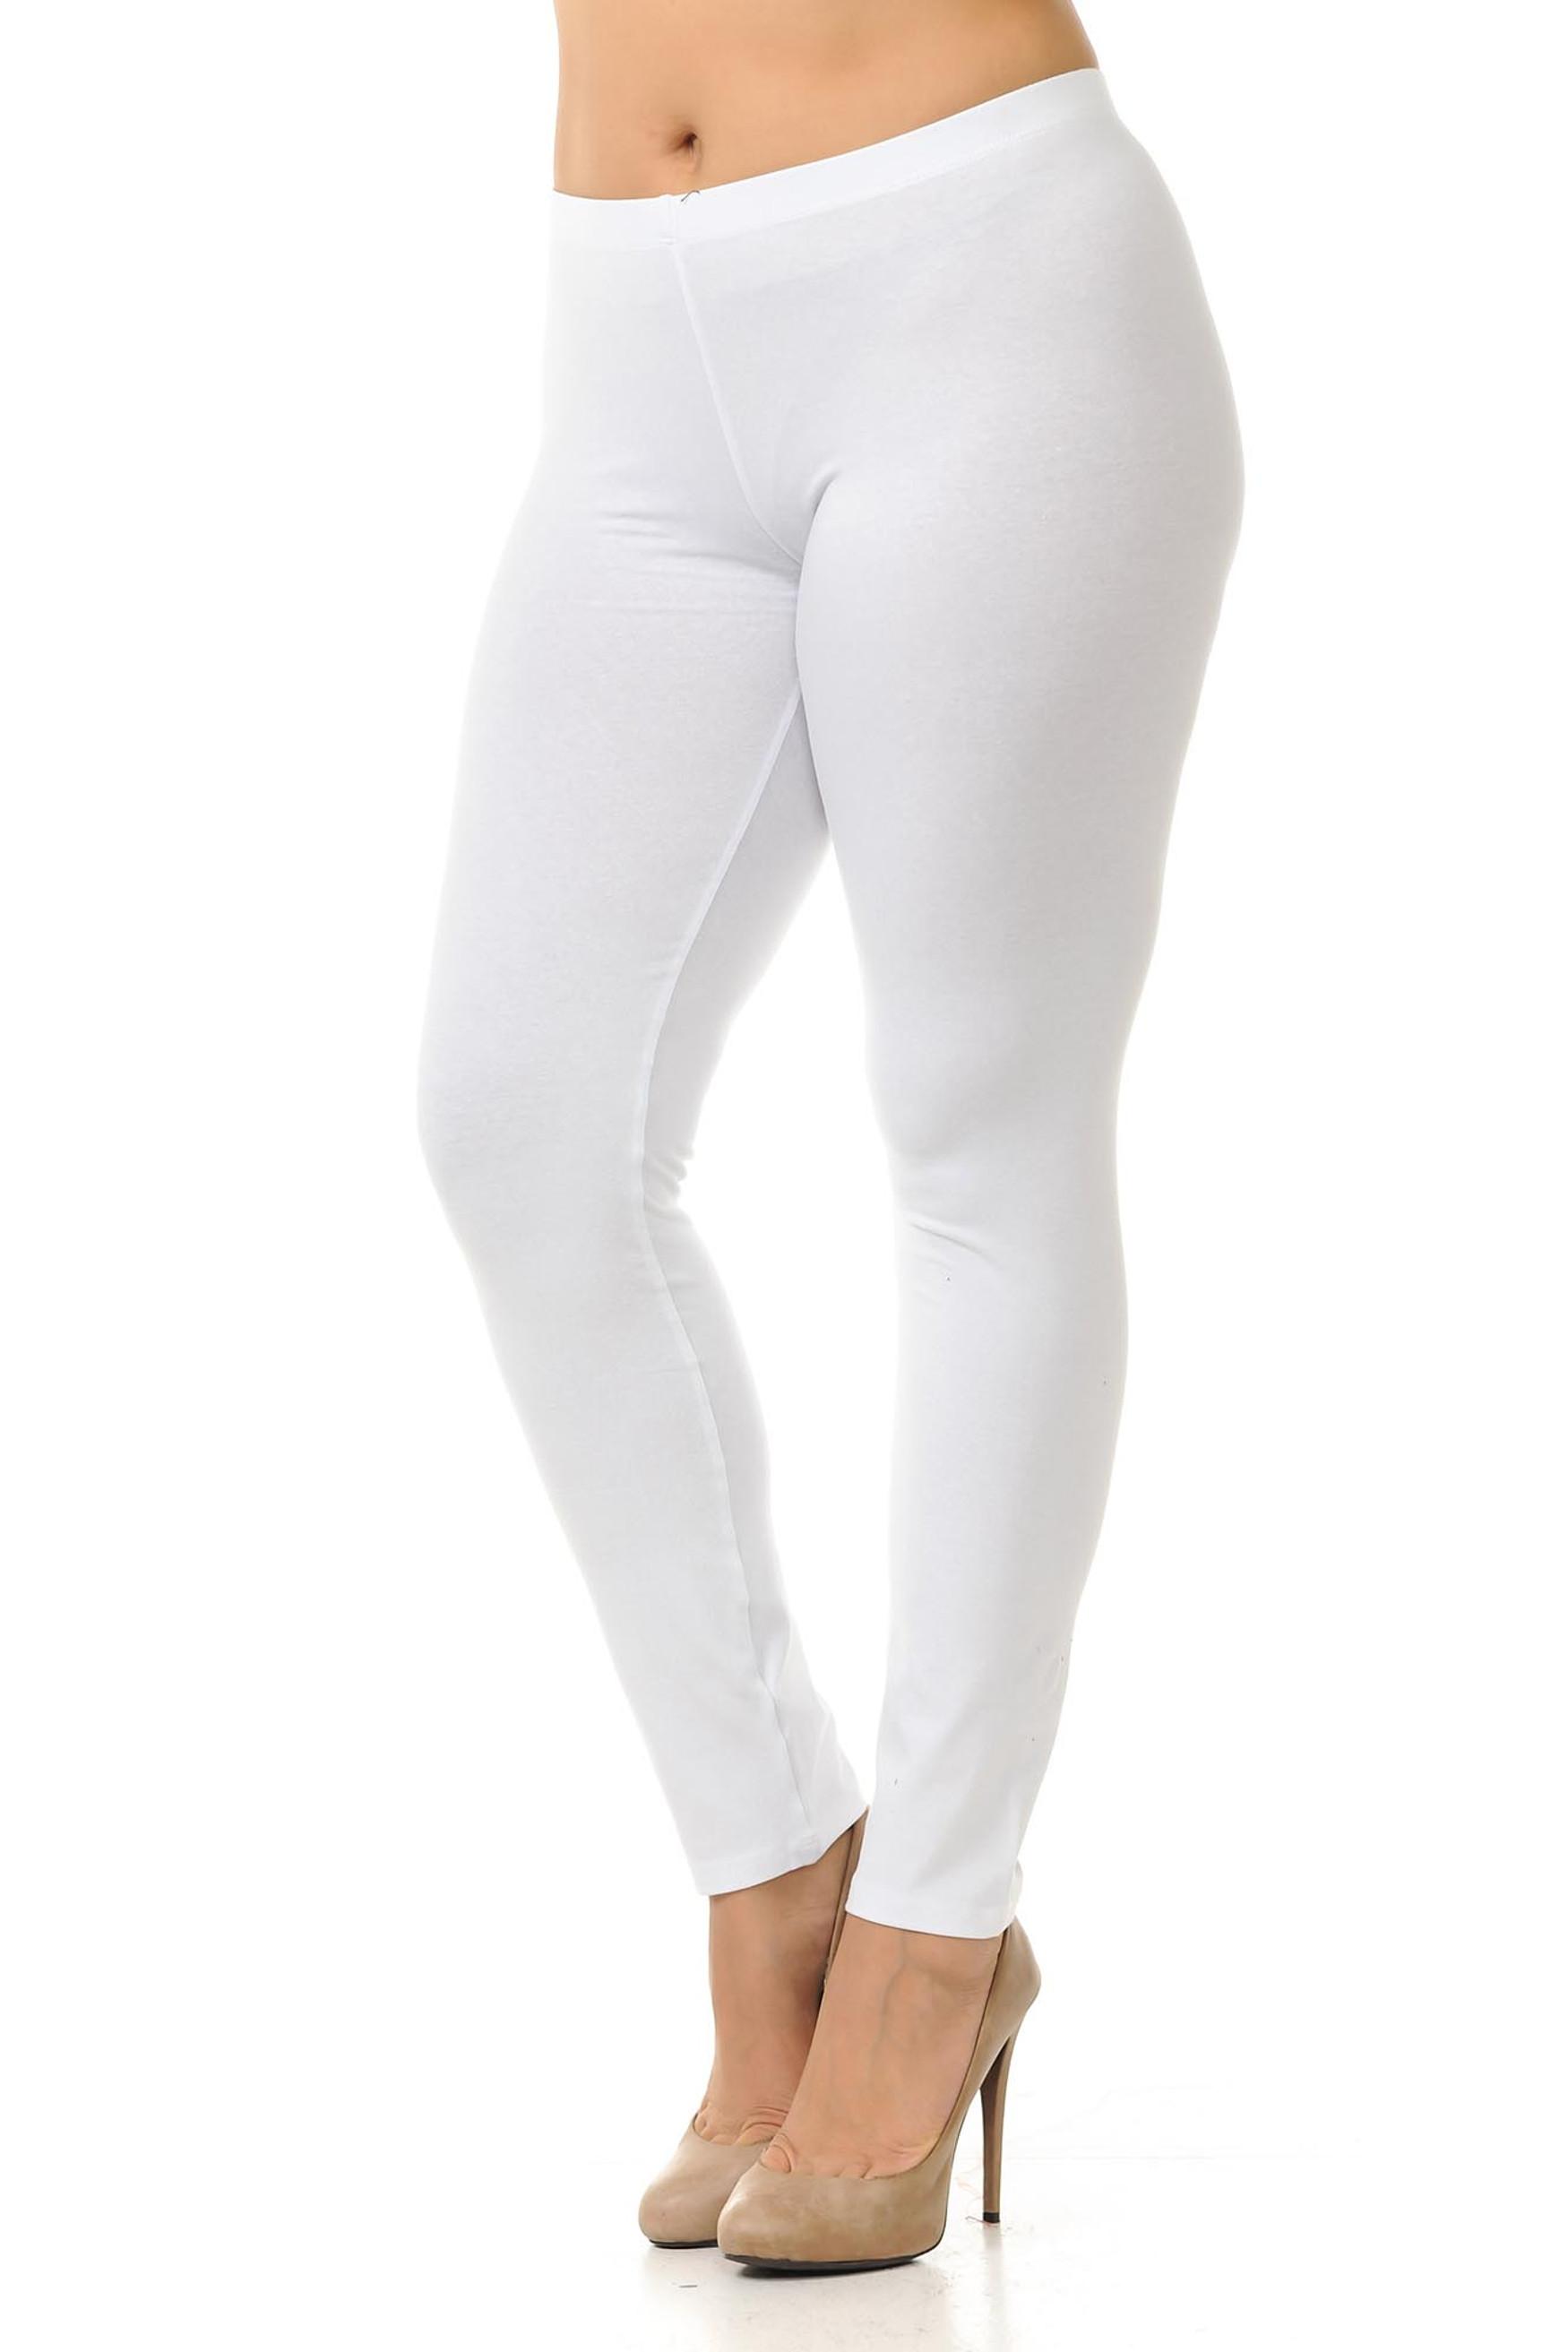 45 degree angled view of white plus size qUSA Cotton Full Length Leggings